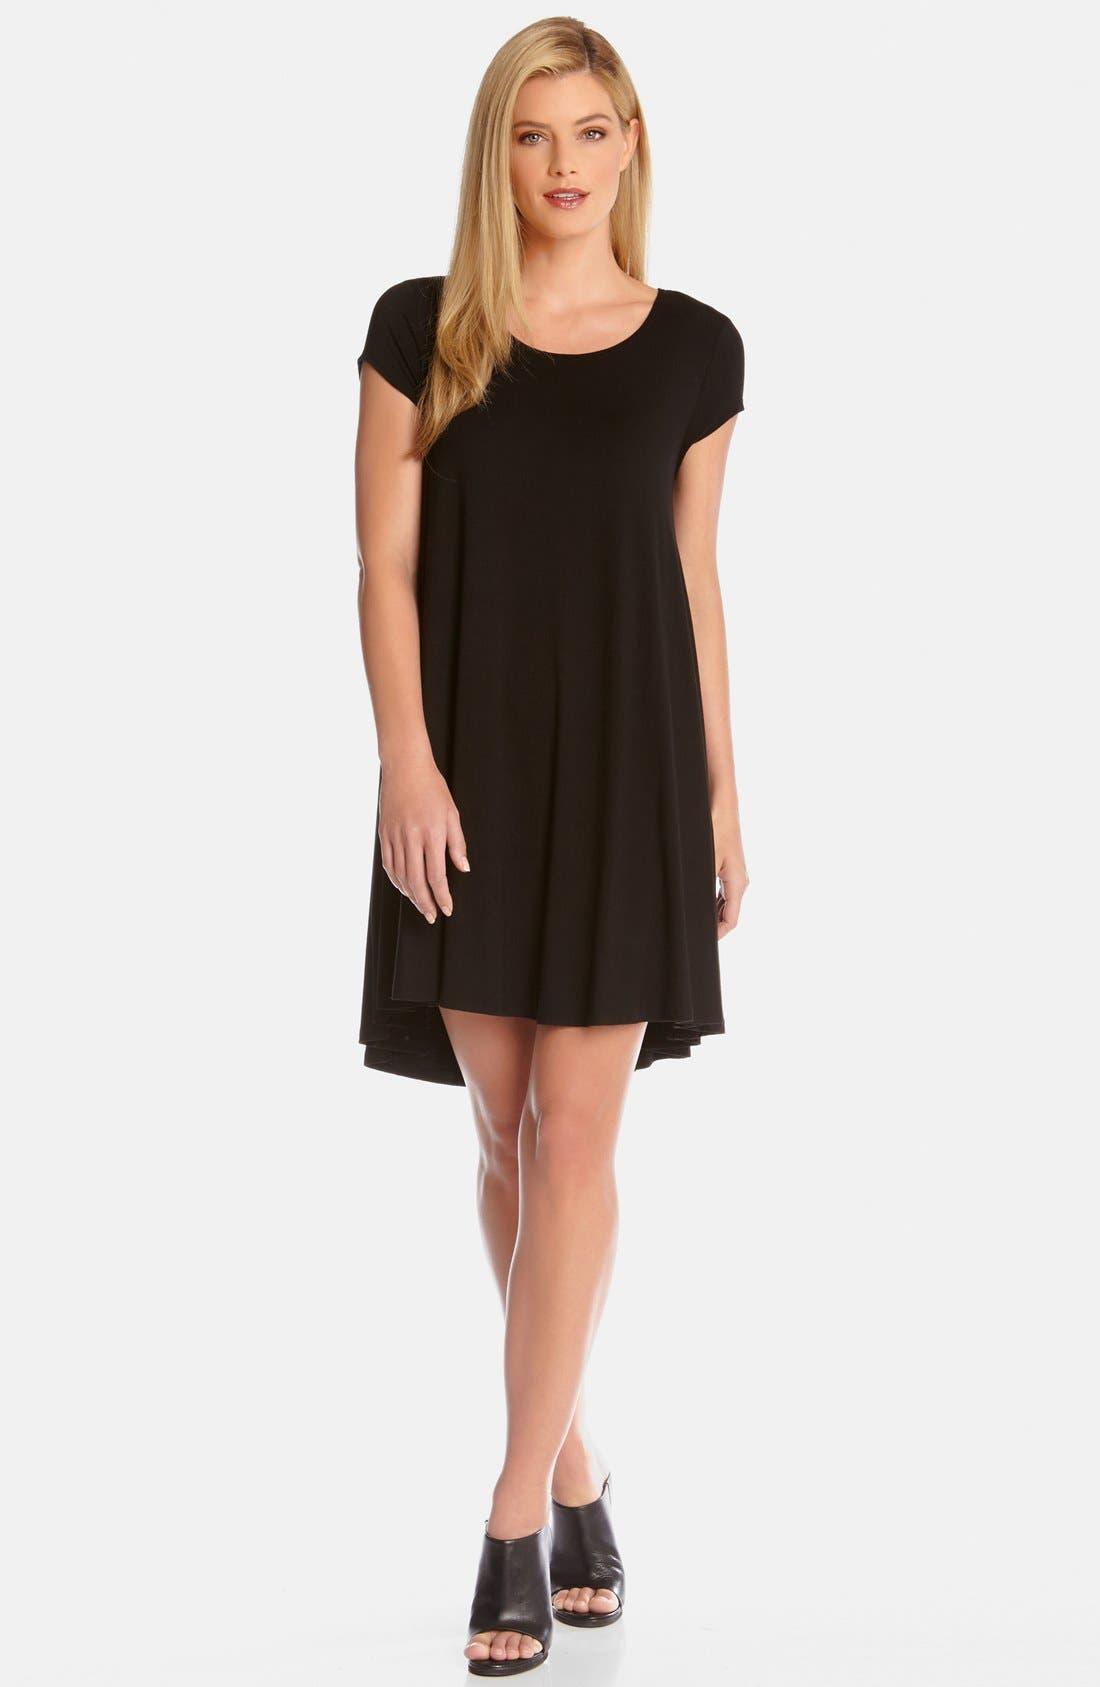 KAREN KANE 'Maggie' Cap Sleeve Trapeze Dress, Main, color, BLACK